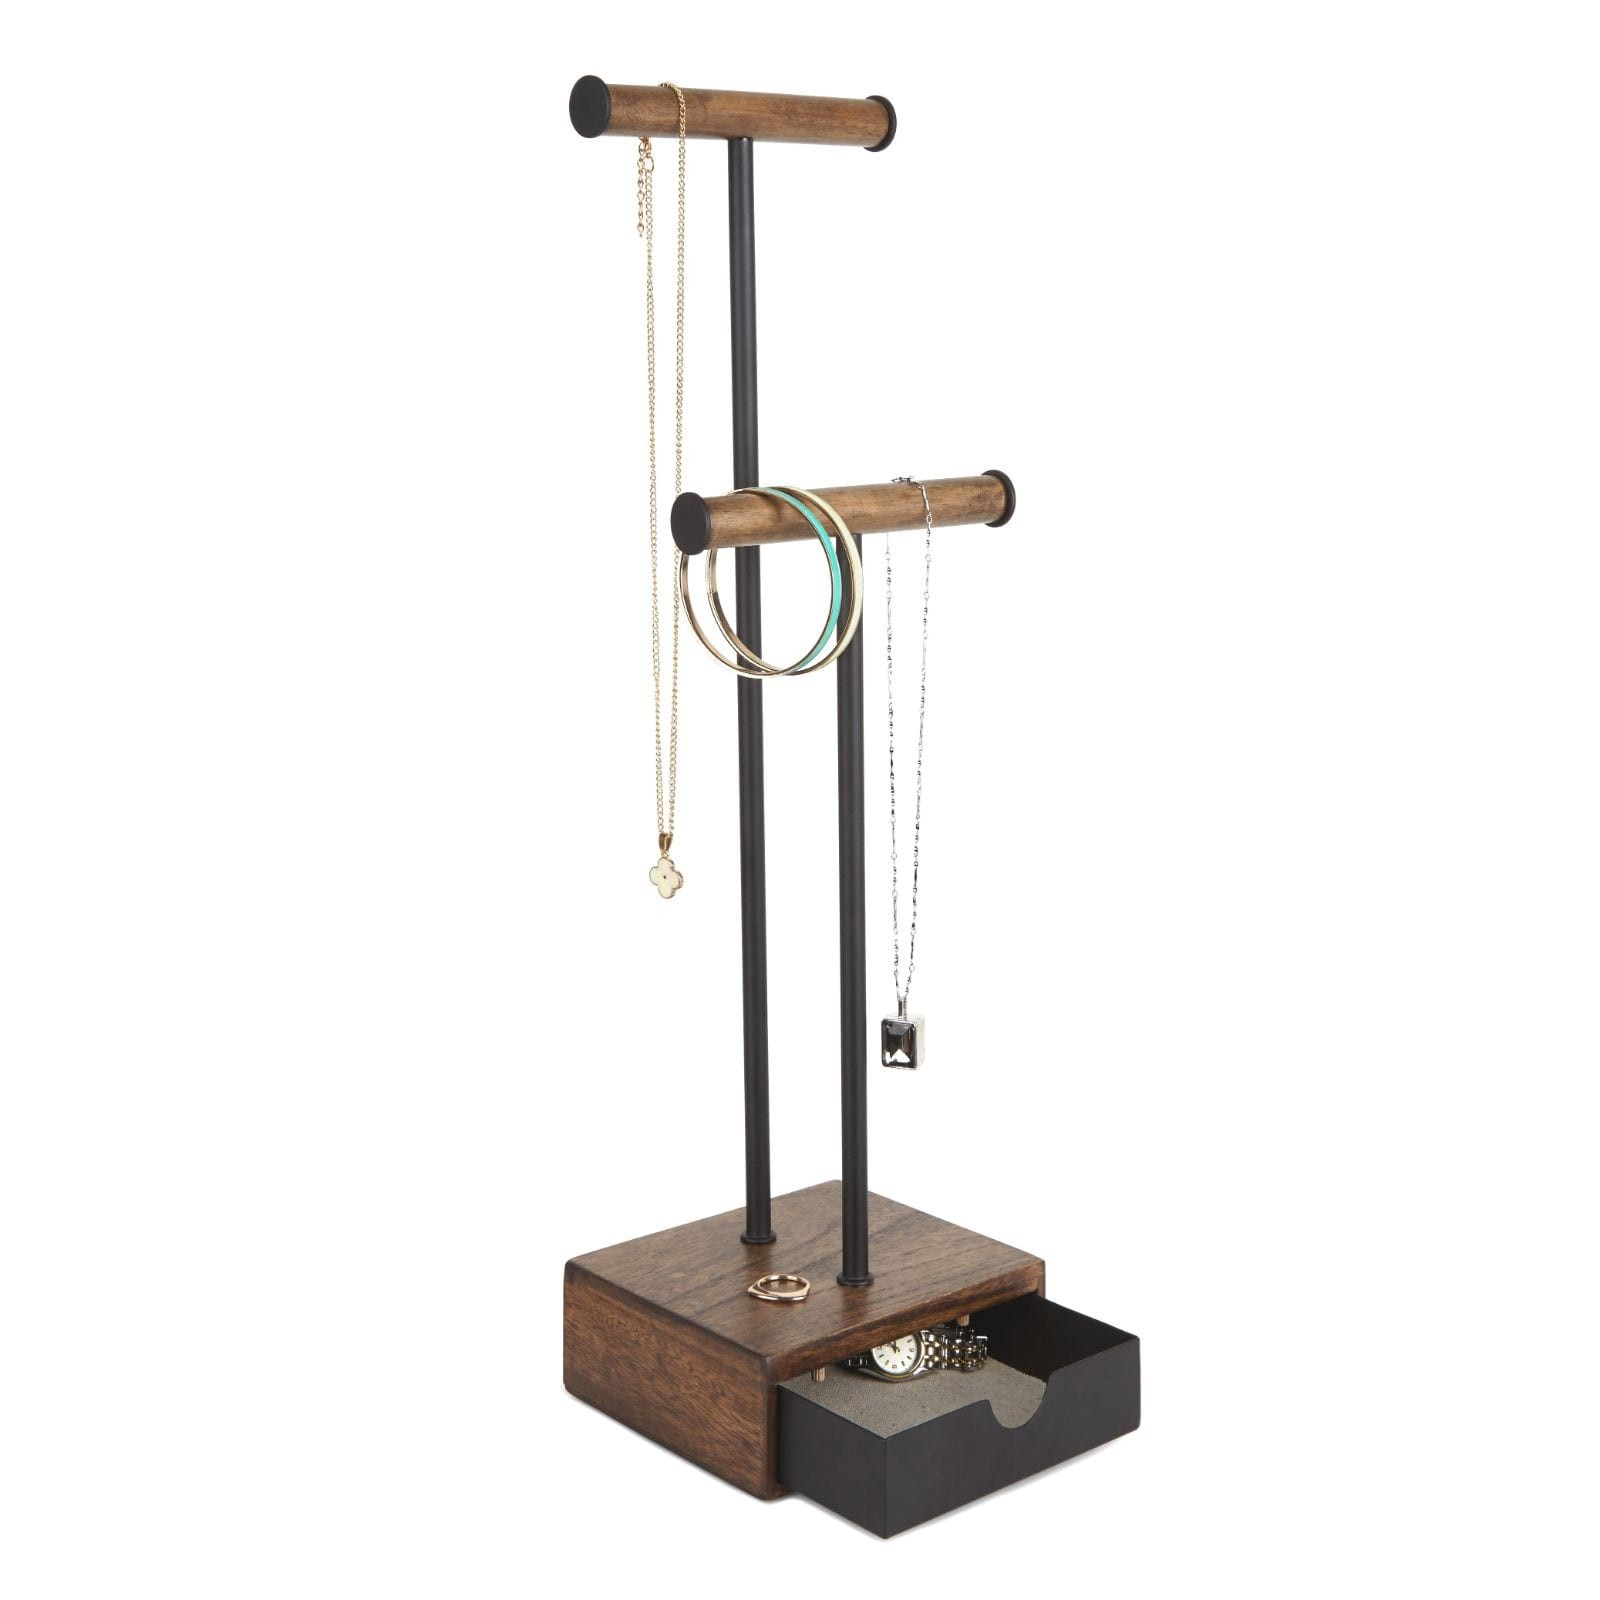 Pillar Jewelry Stand (Black / Walnut) - Umbra